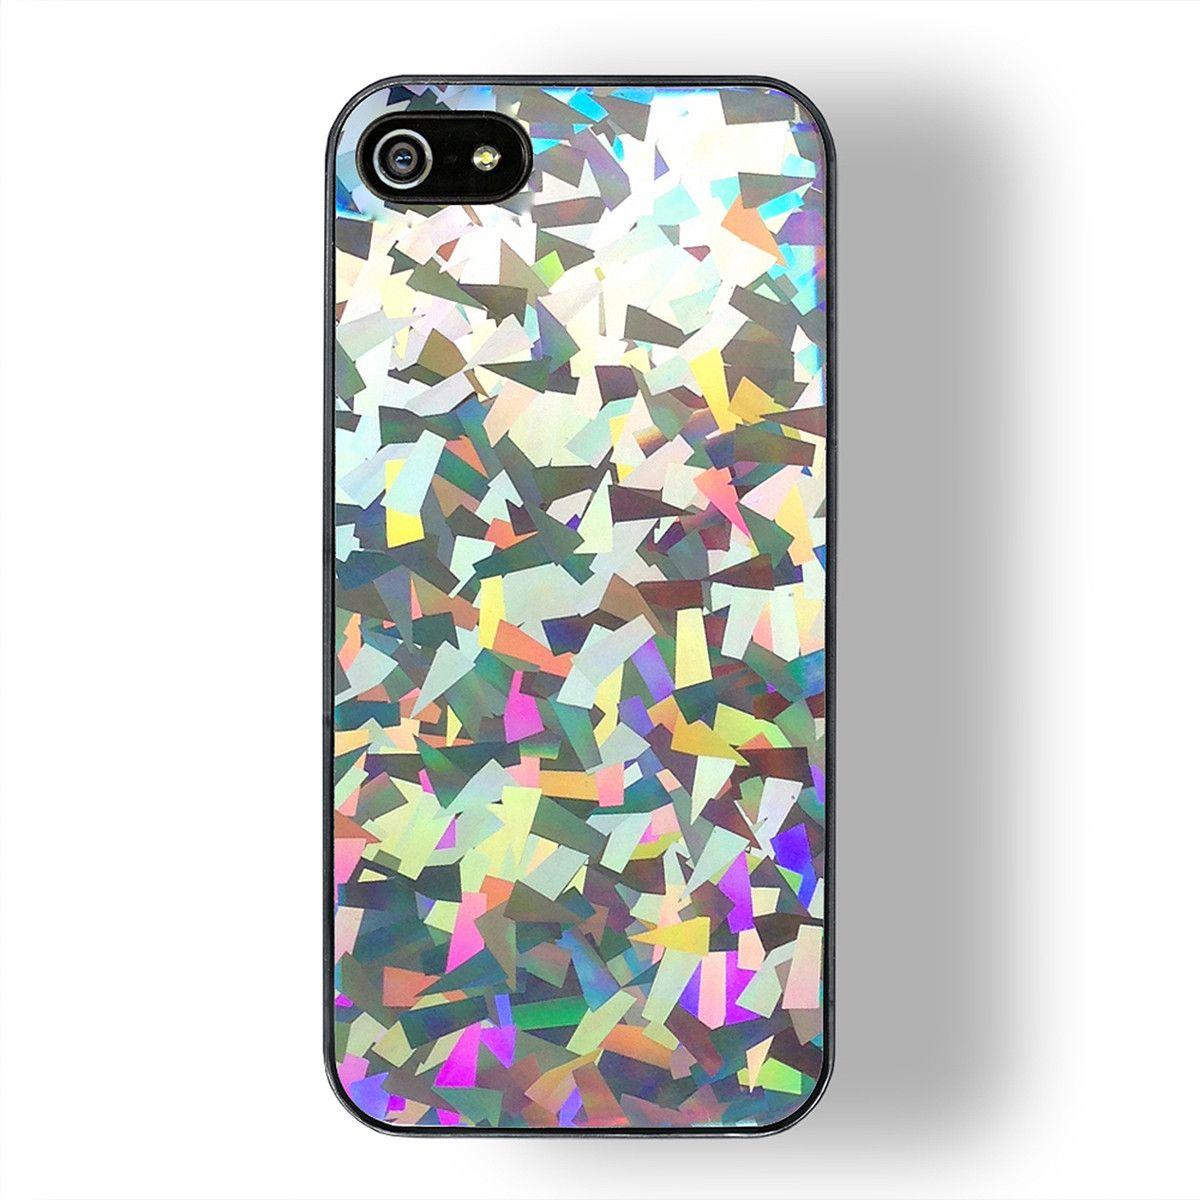 Andromeda Hologram iPhone 5 Case